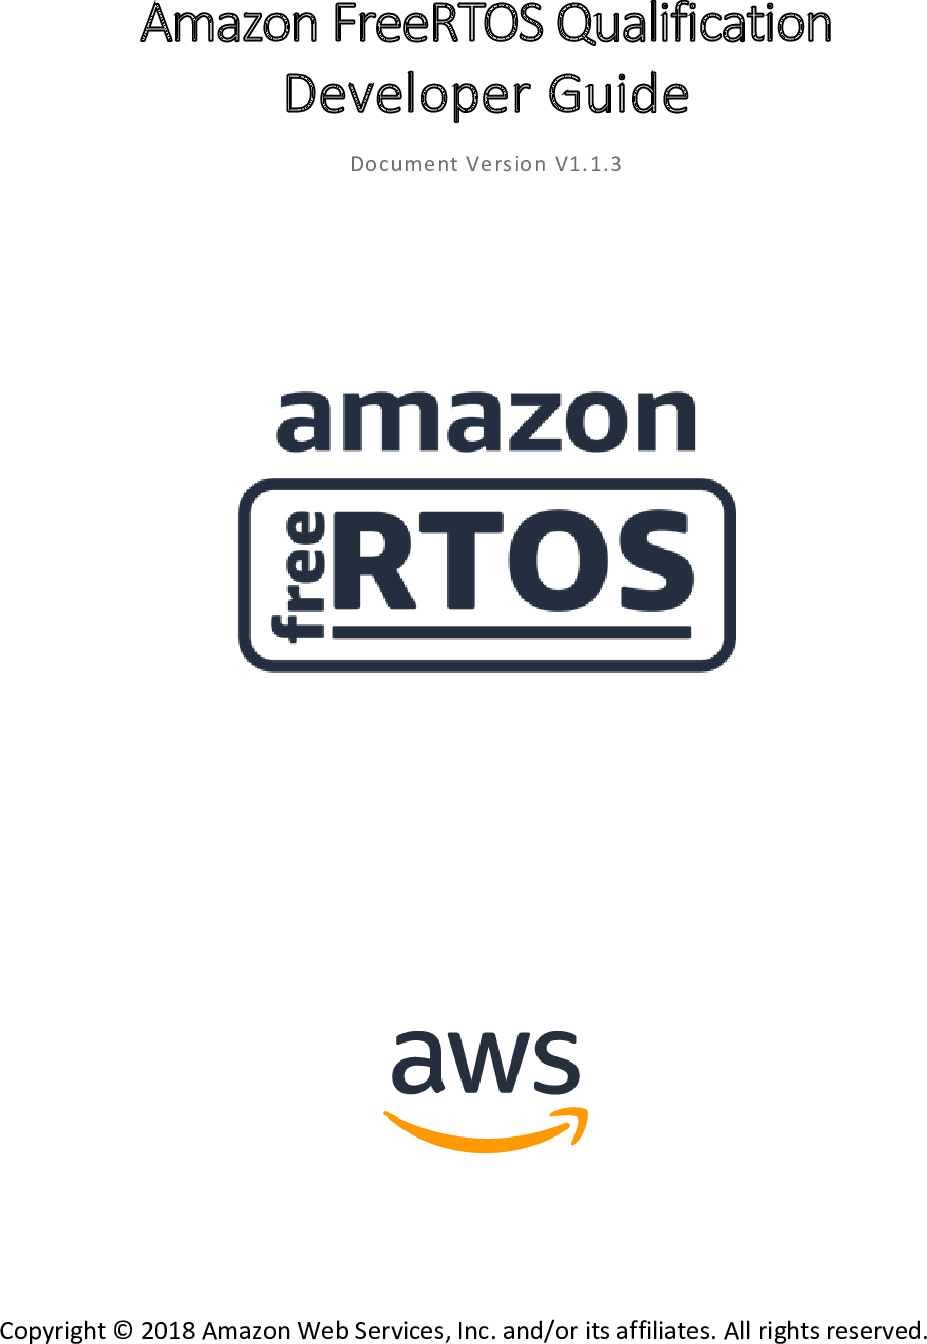 Amazon Free RTOS Qualification Program Developer Guide